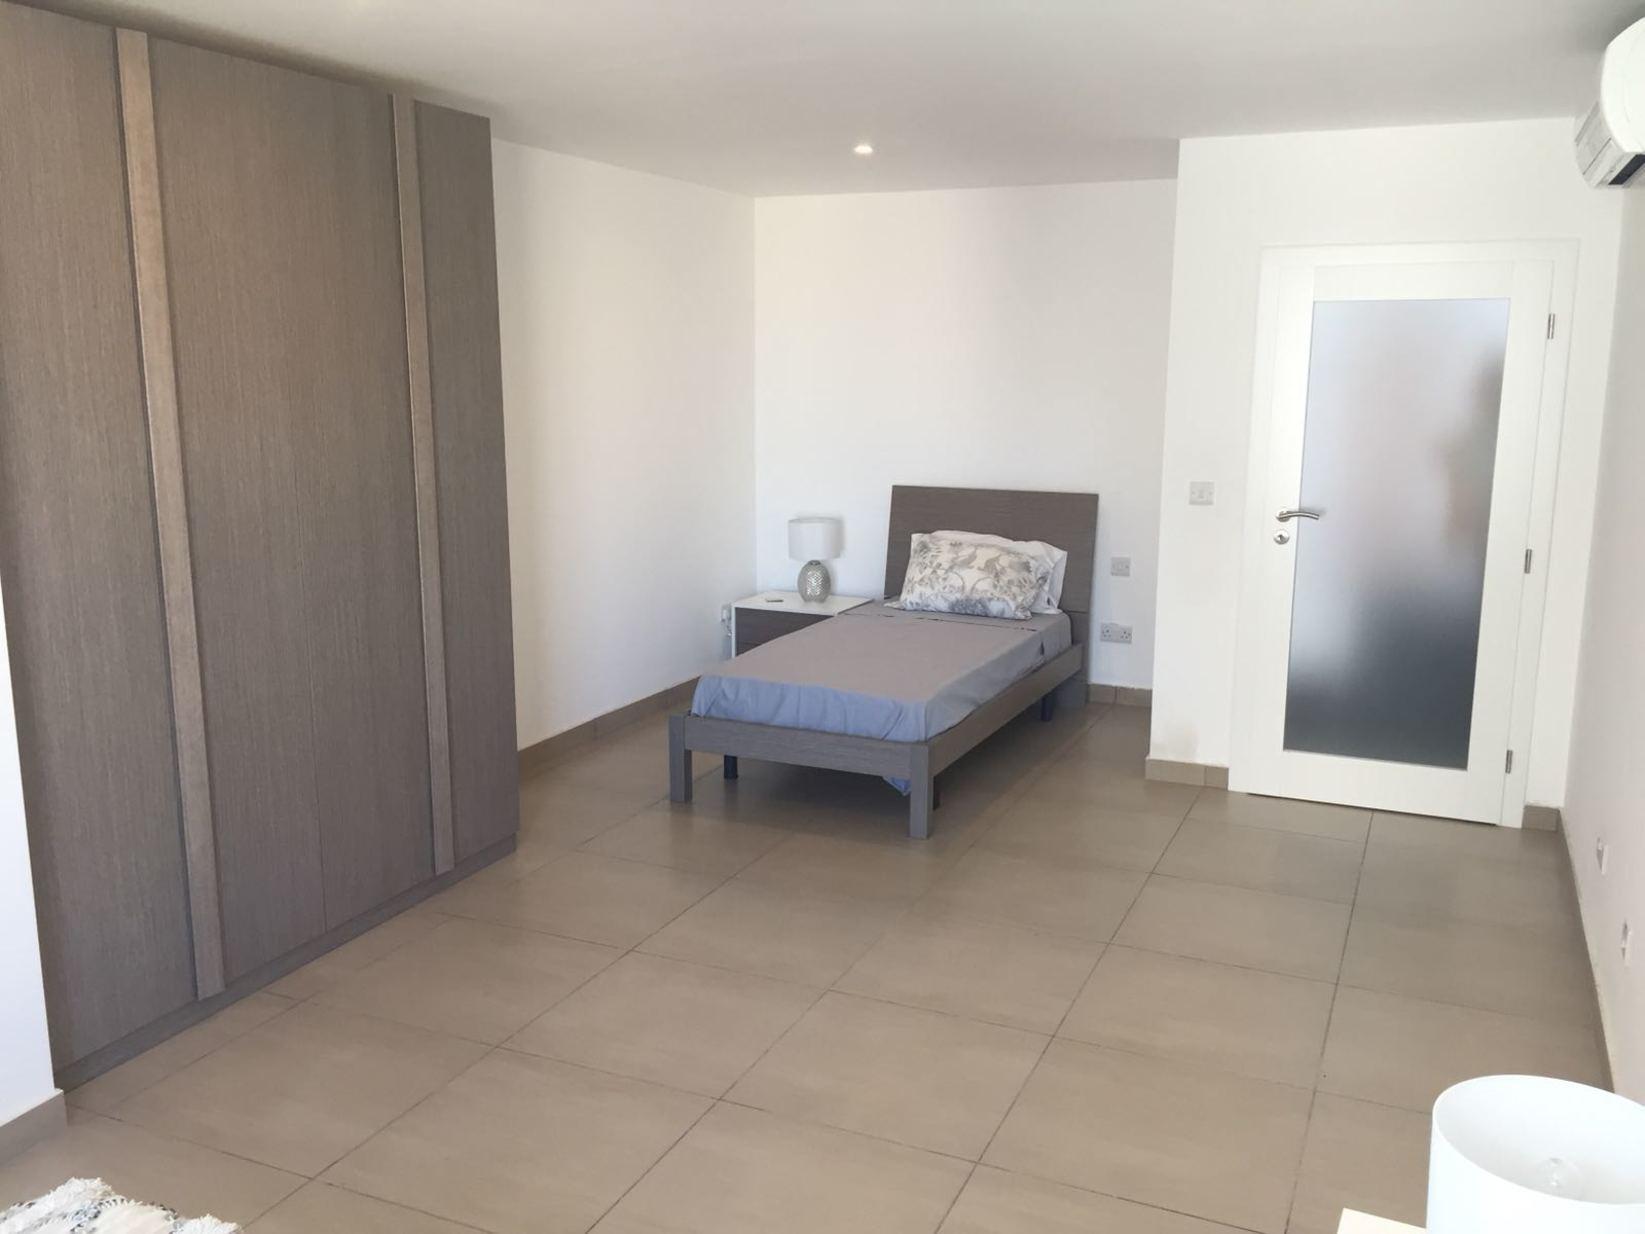 2 bed Apartment For Rent in Sliema, Sliema - thumb 8